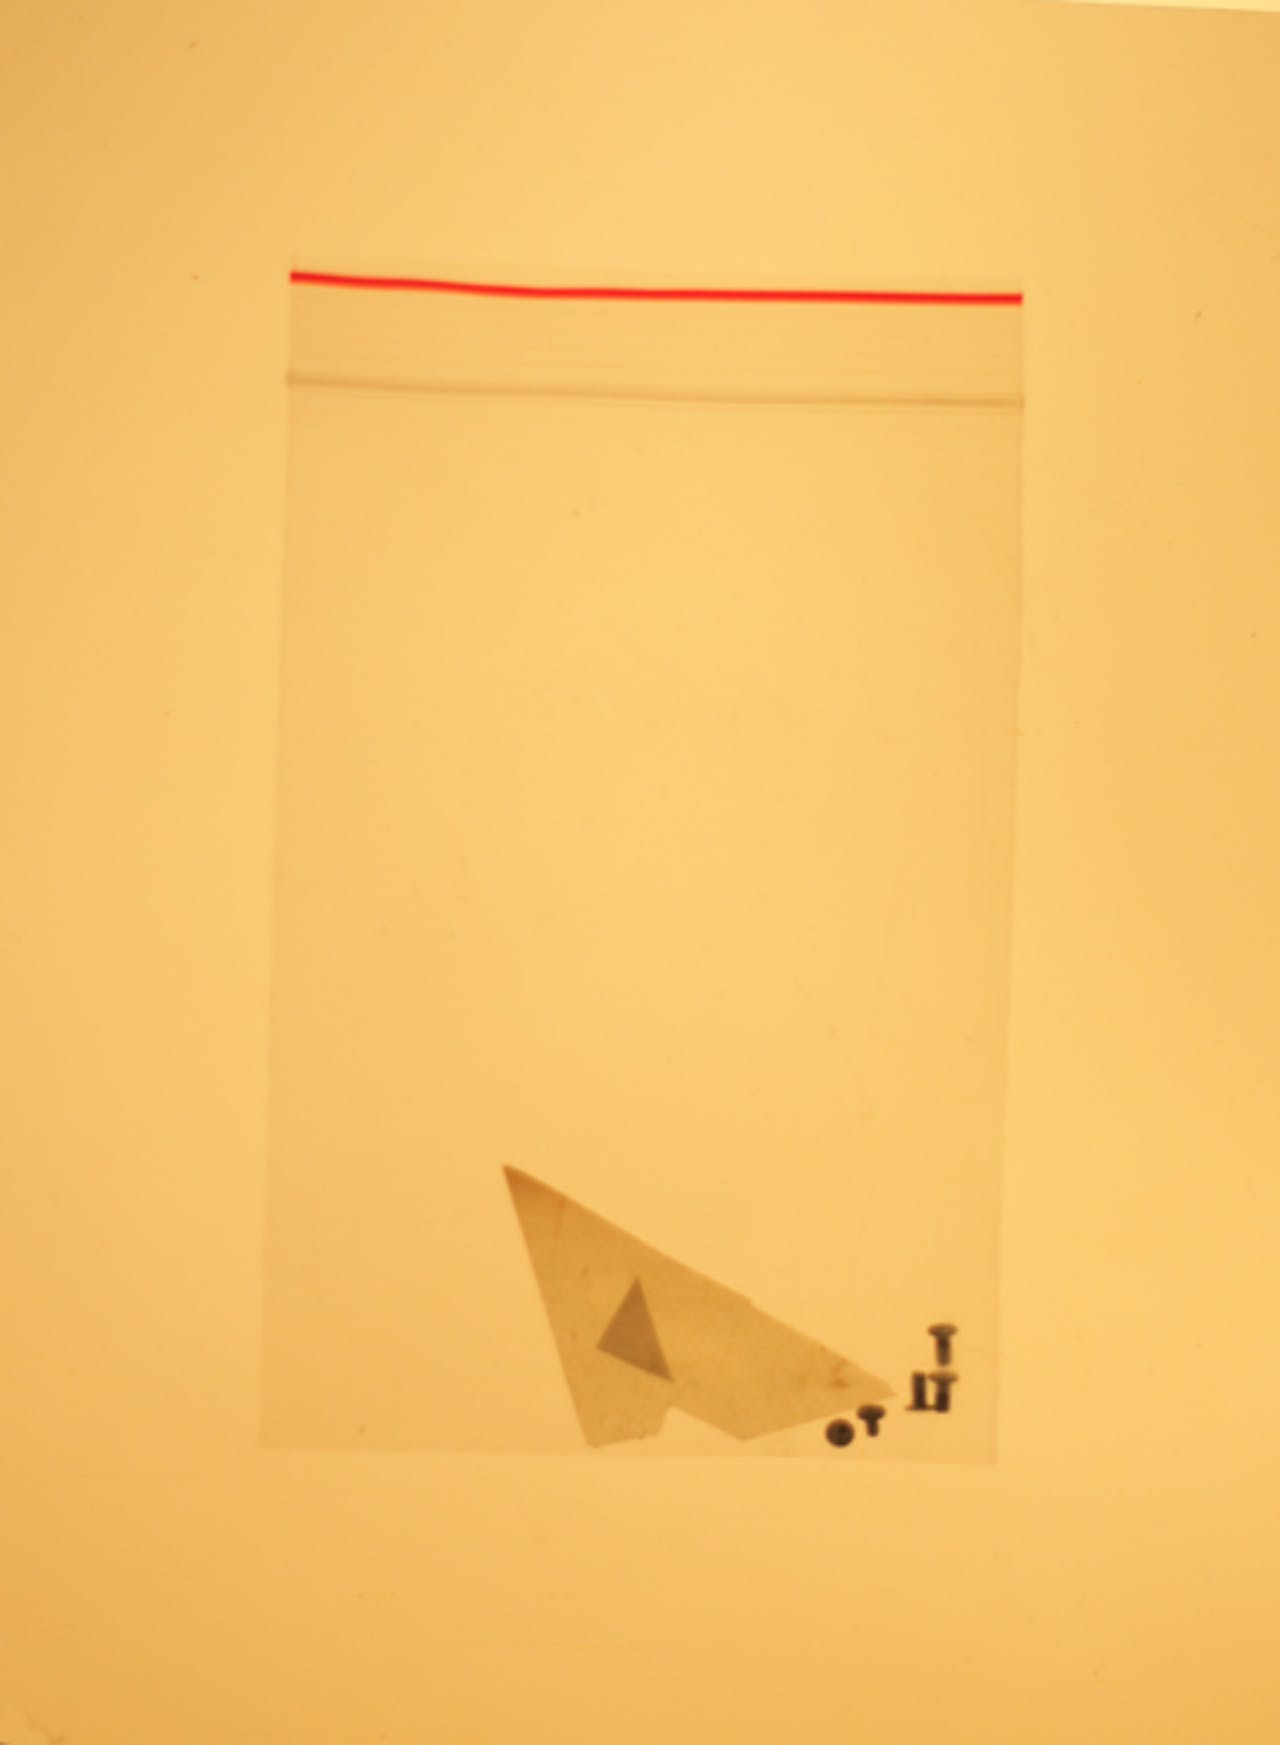 Modulor x ArtConnect Open Call: Polariser von Rory Malone